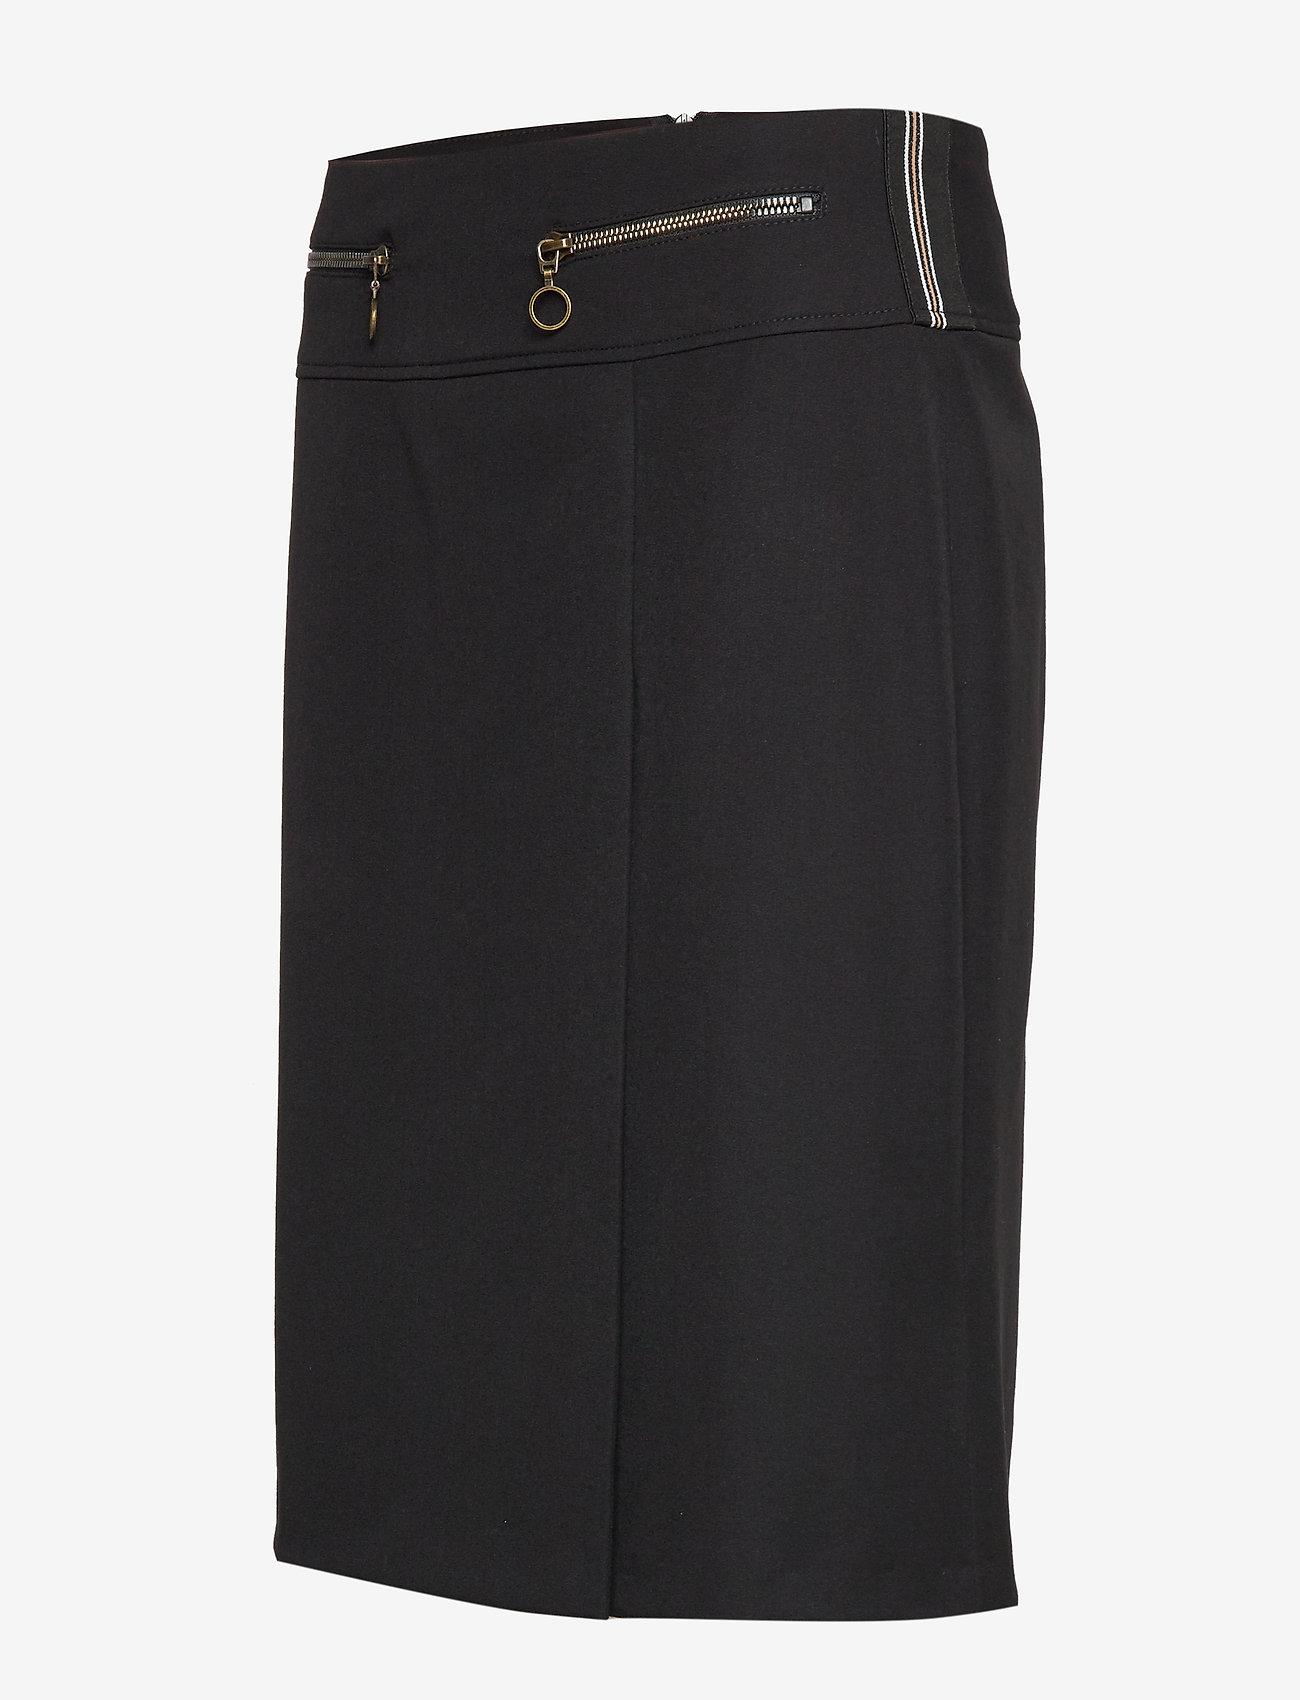 Skirt Medium Length Classic (Black) (459.60 kr) - Betty Barclay